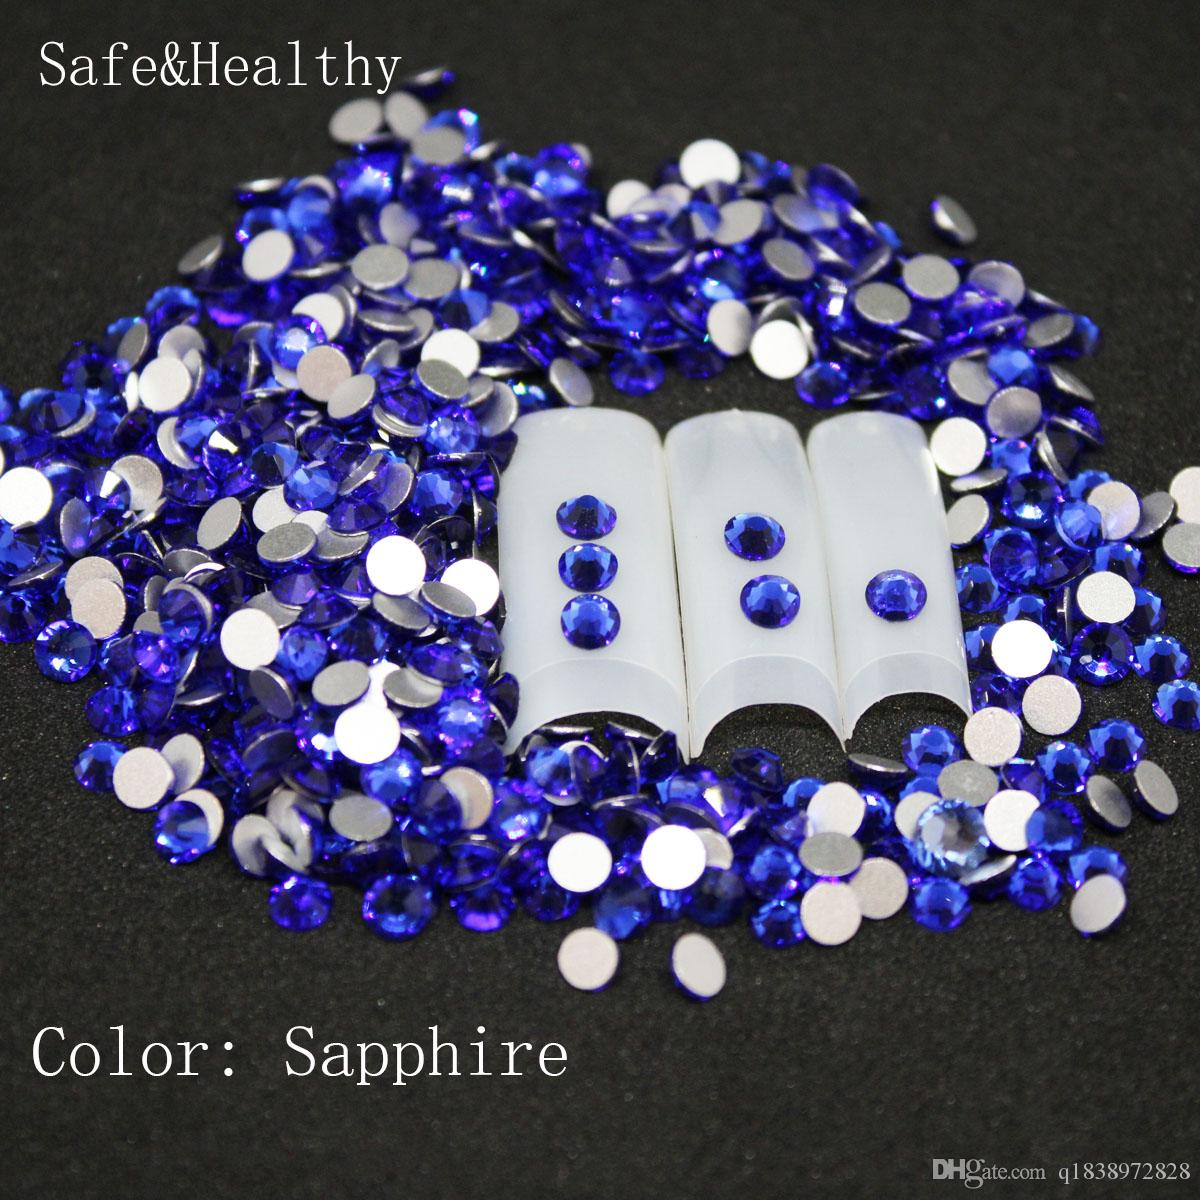 1440 pcs/Pack SS3-SS50 Sapphire Nail Art Decorations Rhinestones For 3d Charm Glass Flatback Non Hotfix DIY Nails Decorations